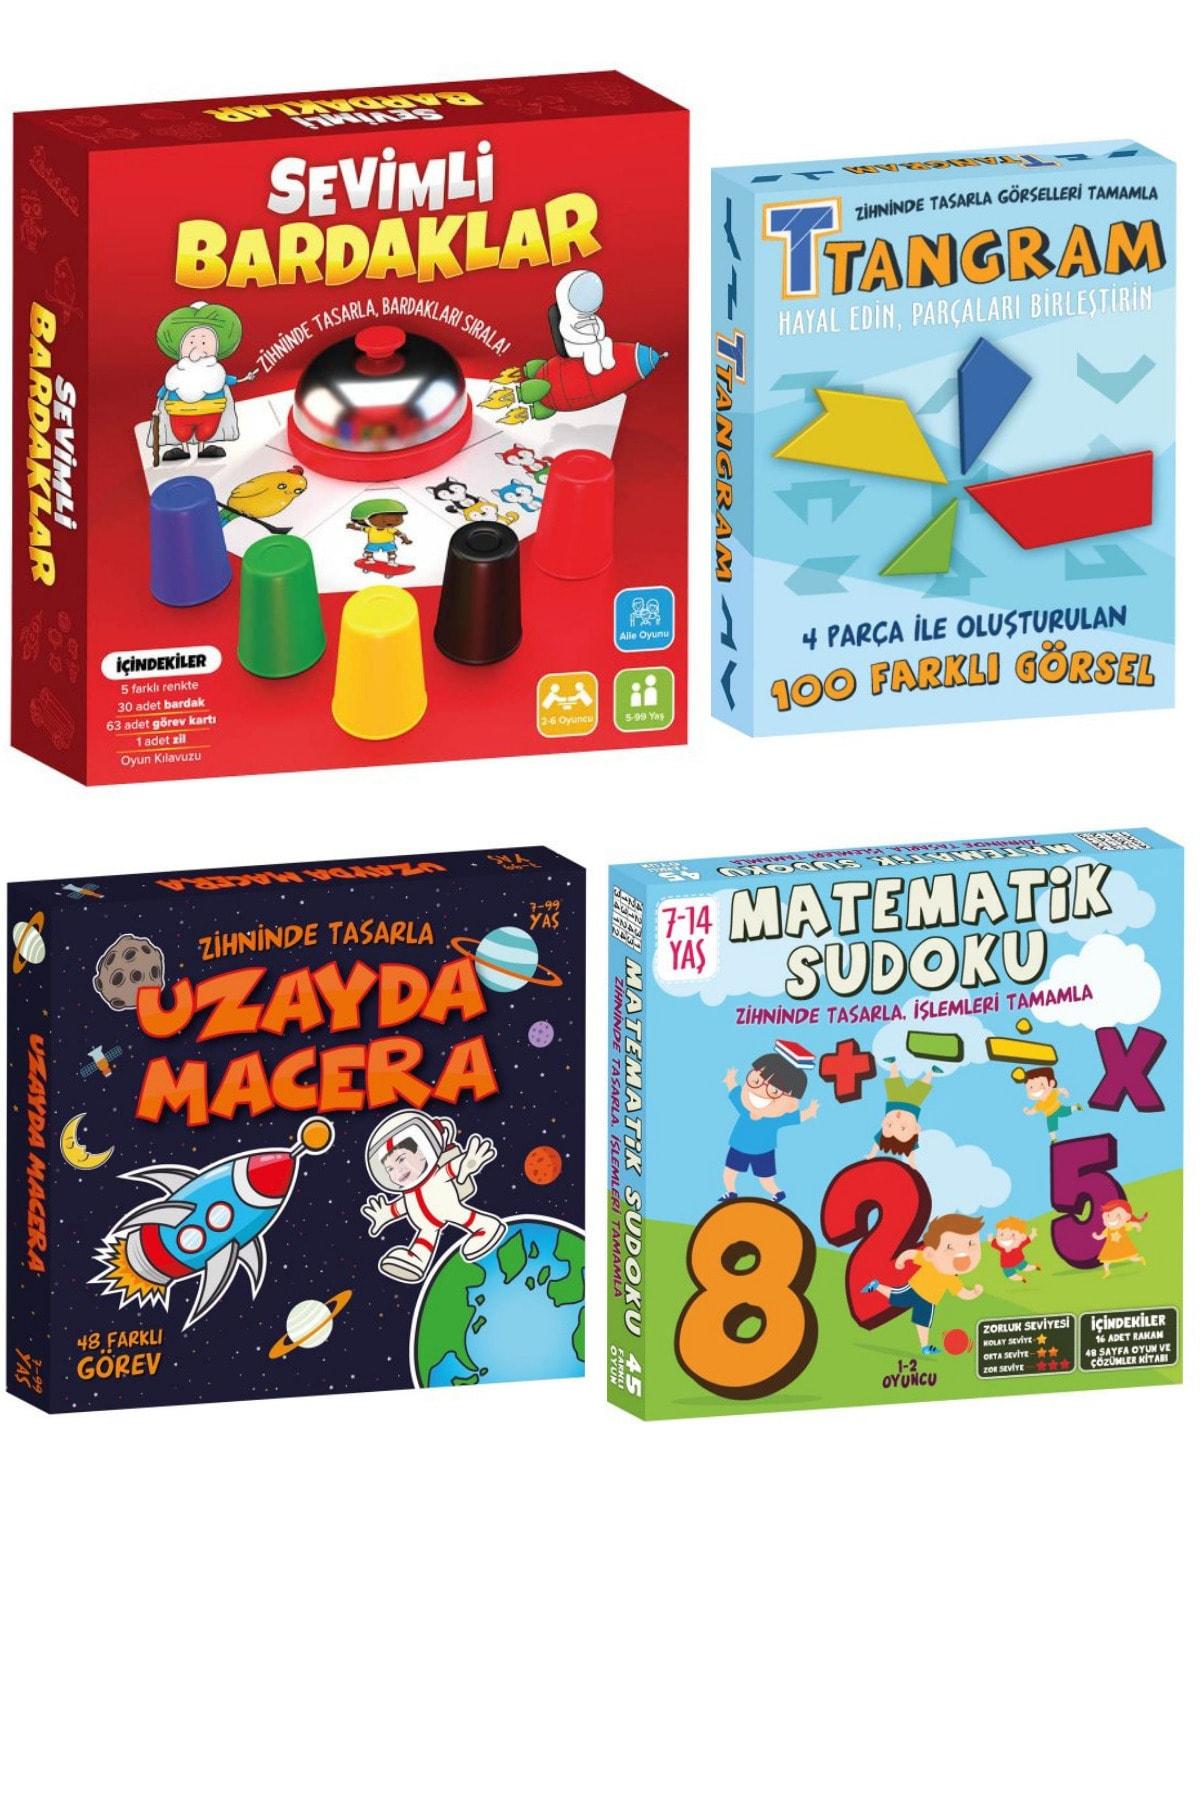 Game Art Kids Holiday Set Mind Intelligence Games Set Glass Game, Space Adventure, Tangram, Mathematical Sudoku Space Adventure